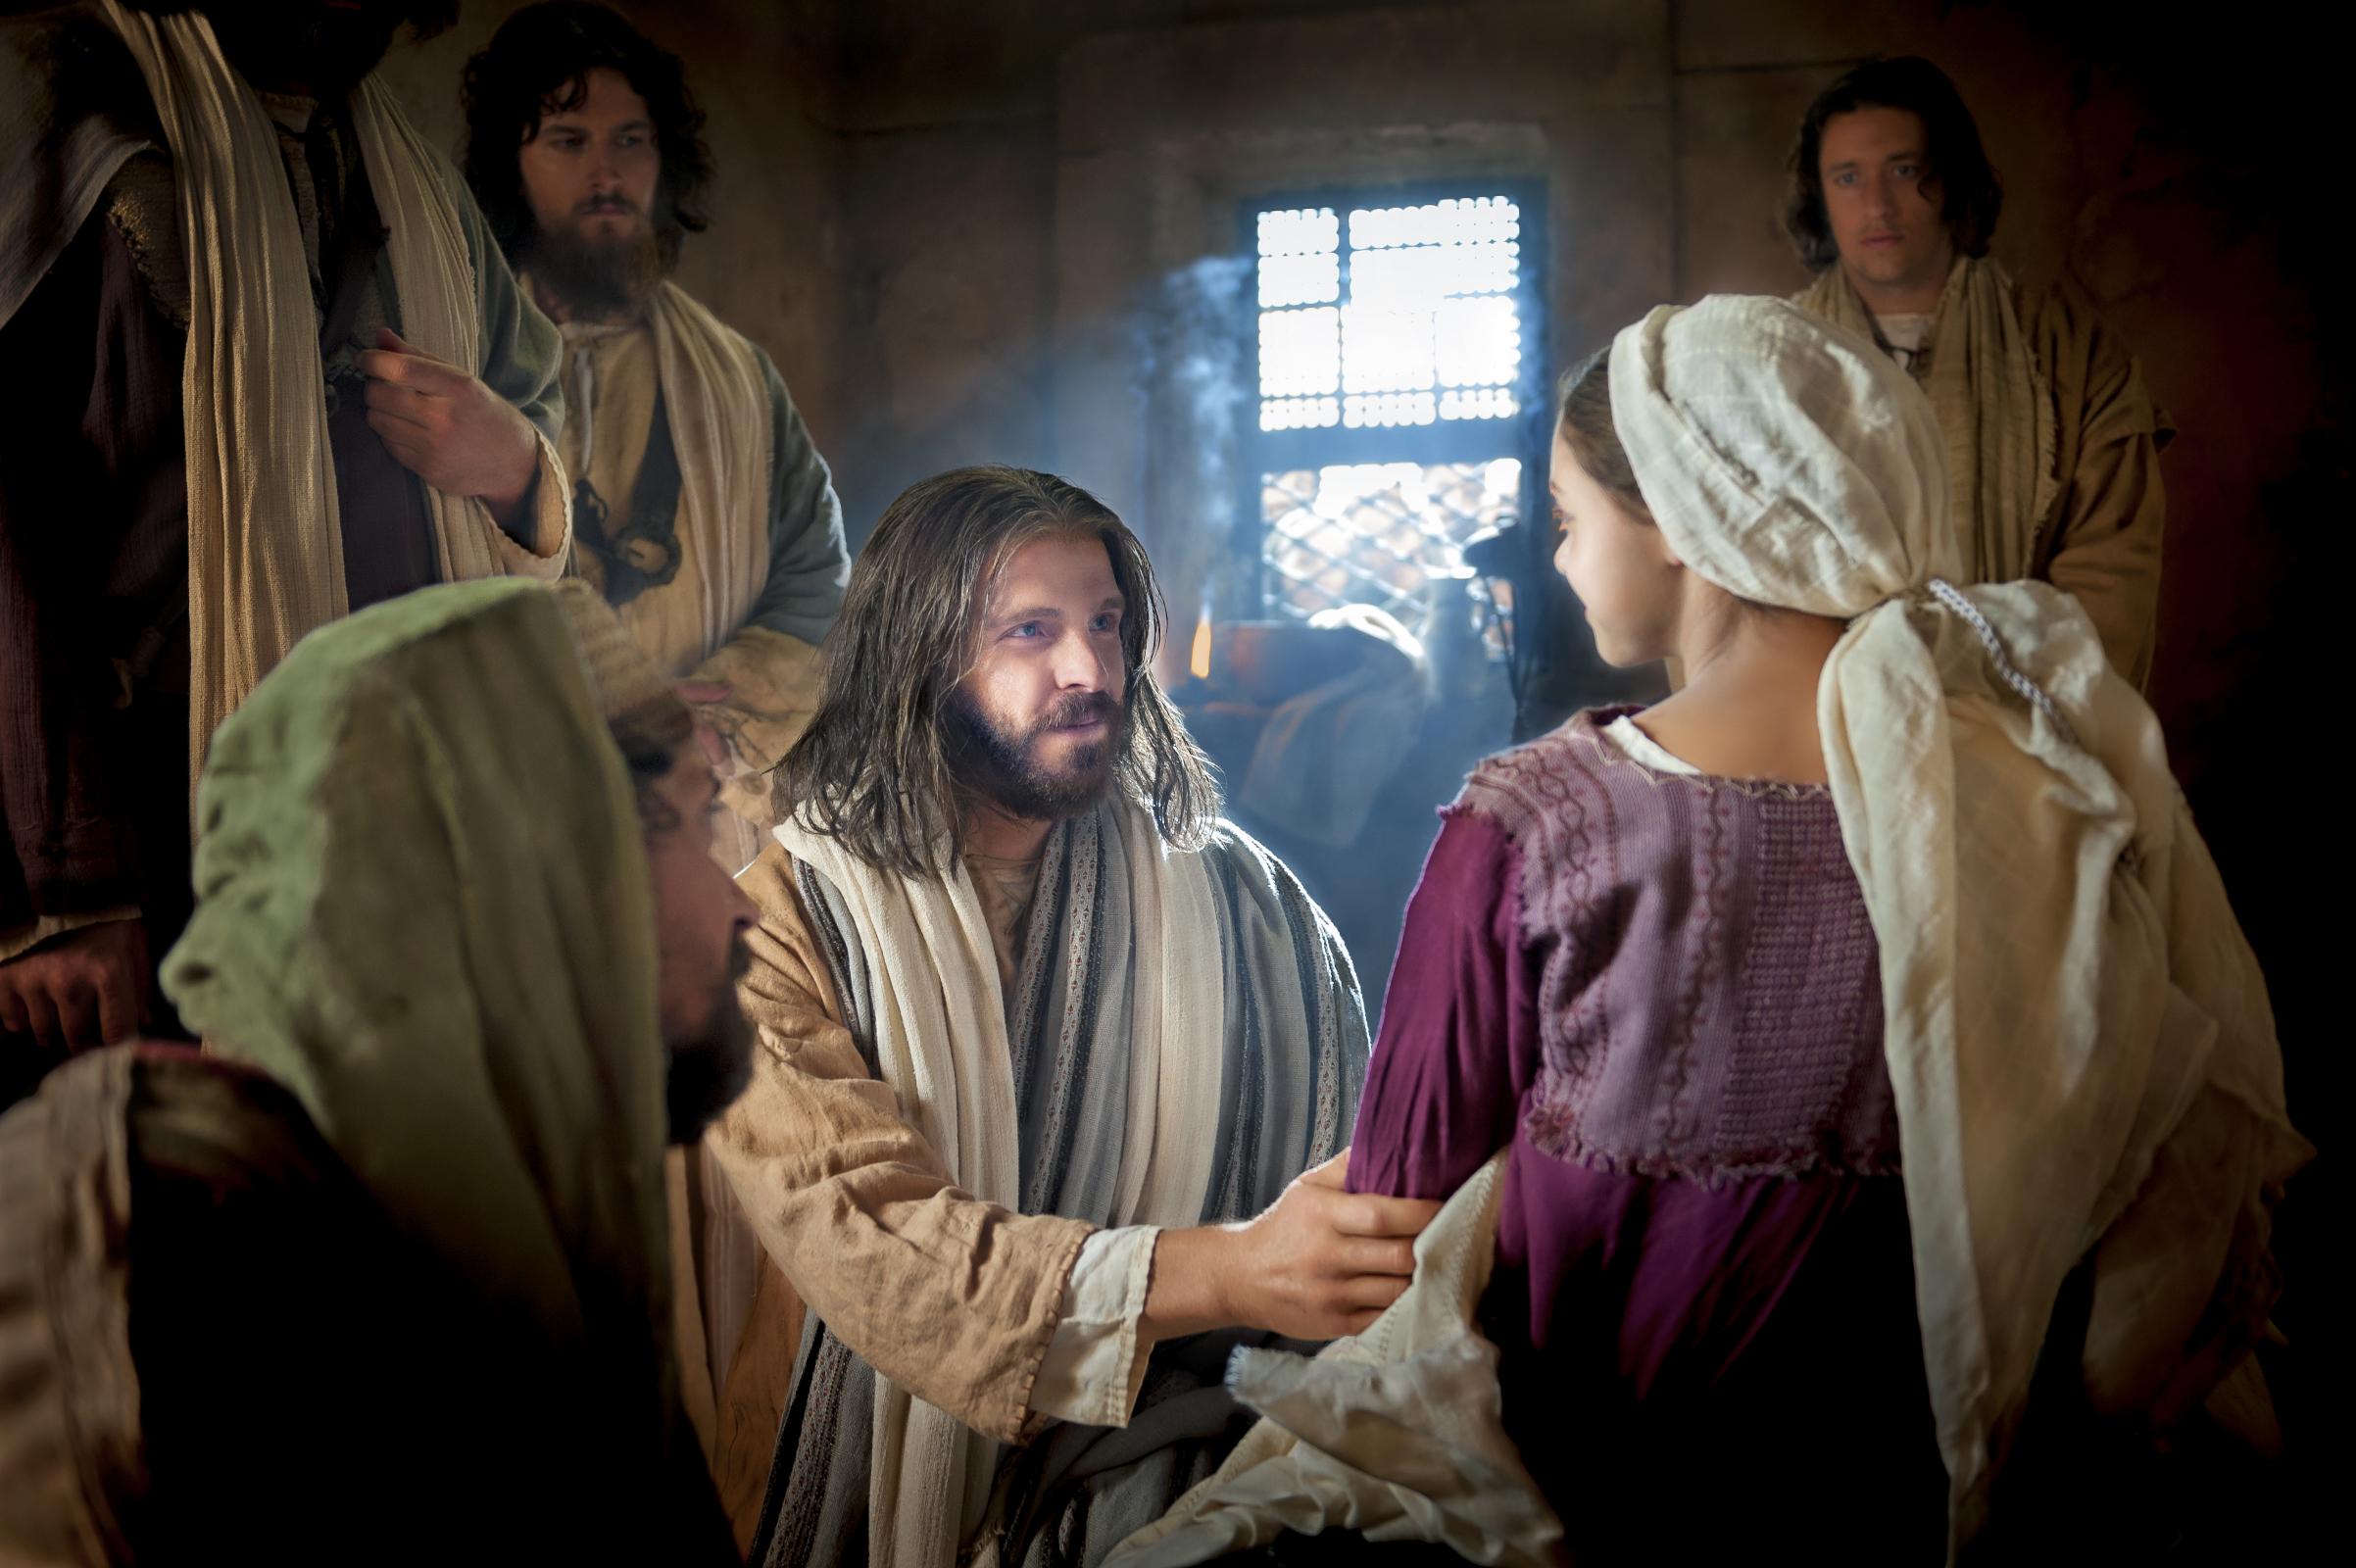 jesus raises the daughter of jairus mormon channel